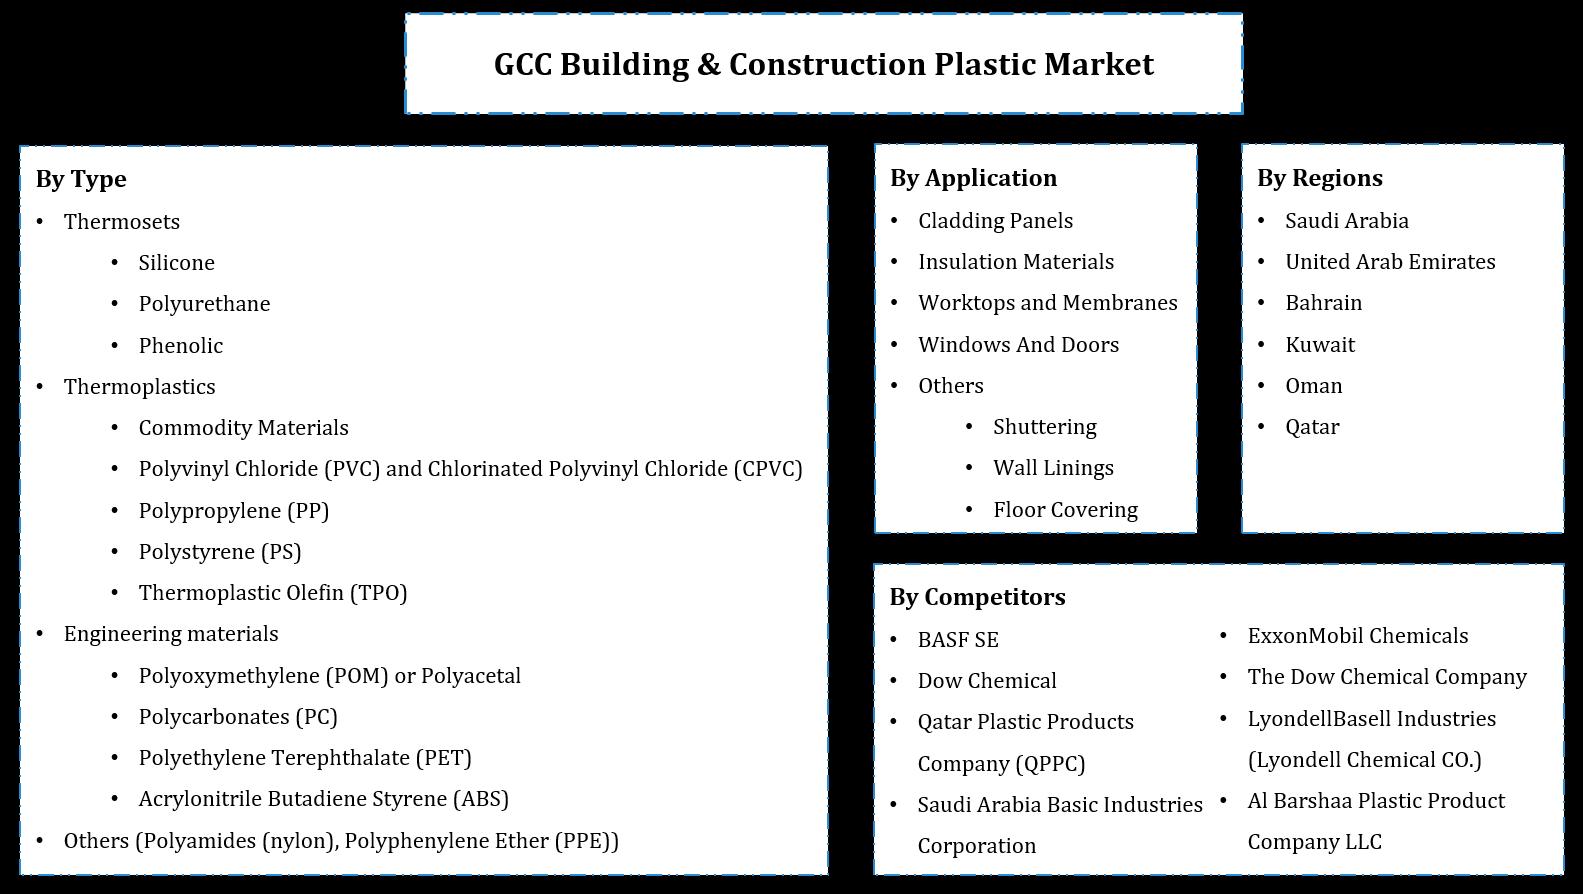 GCC Building & Construction Plastic  Market Segmentation